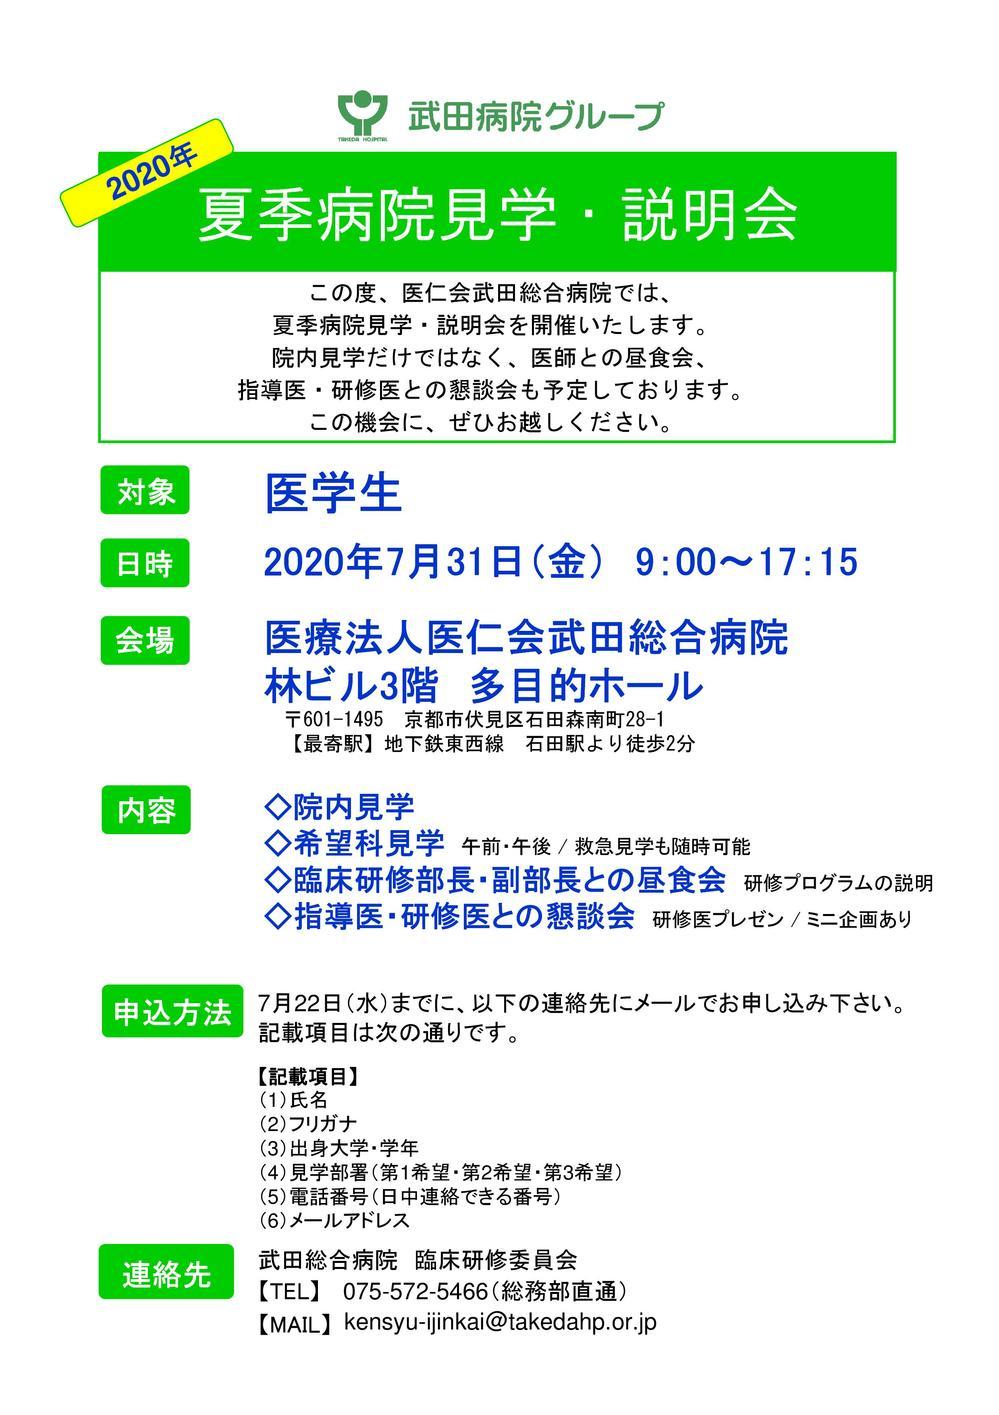 Microsoft PowerPoint - 見学・説明会パターン別_夏季200731_懇親会なし.jpg